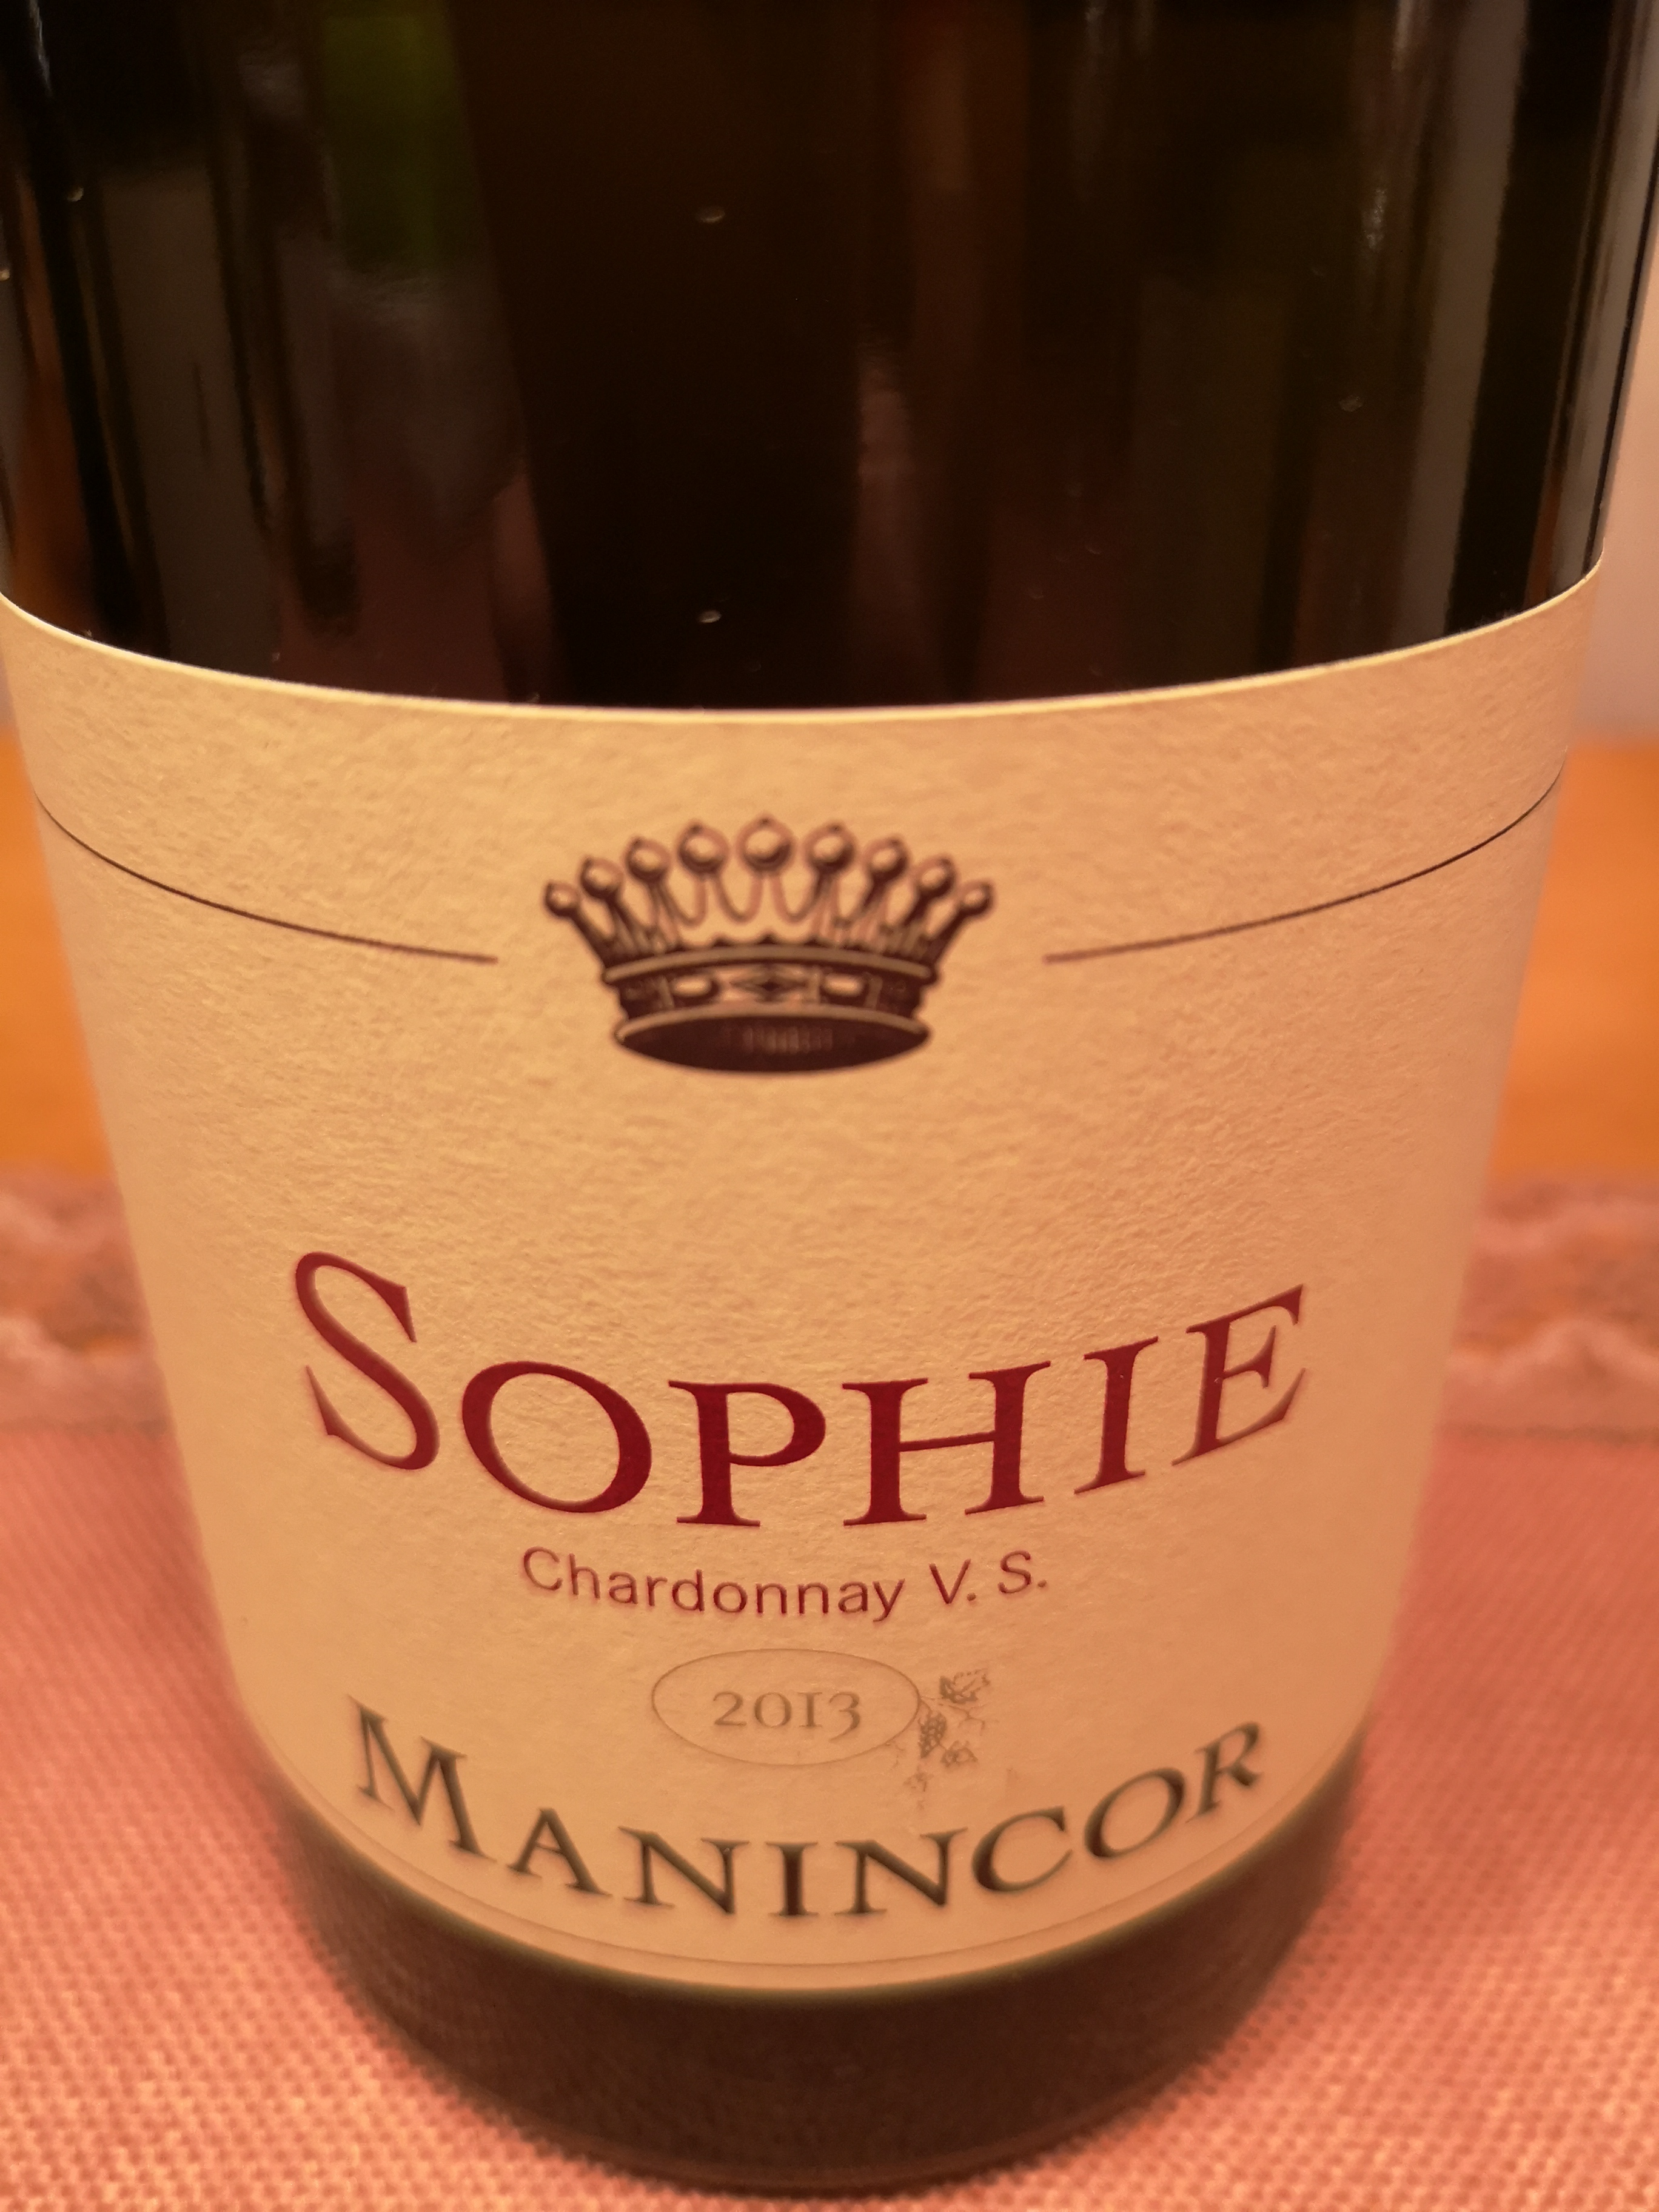 2013 Chardonnay Sophie | Manincor